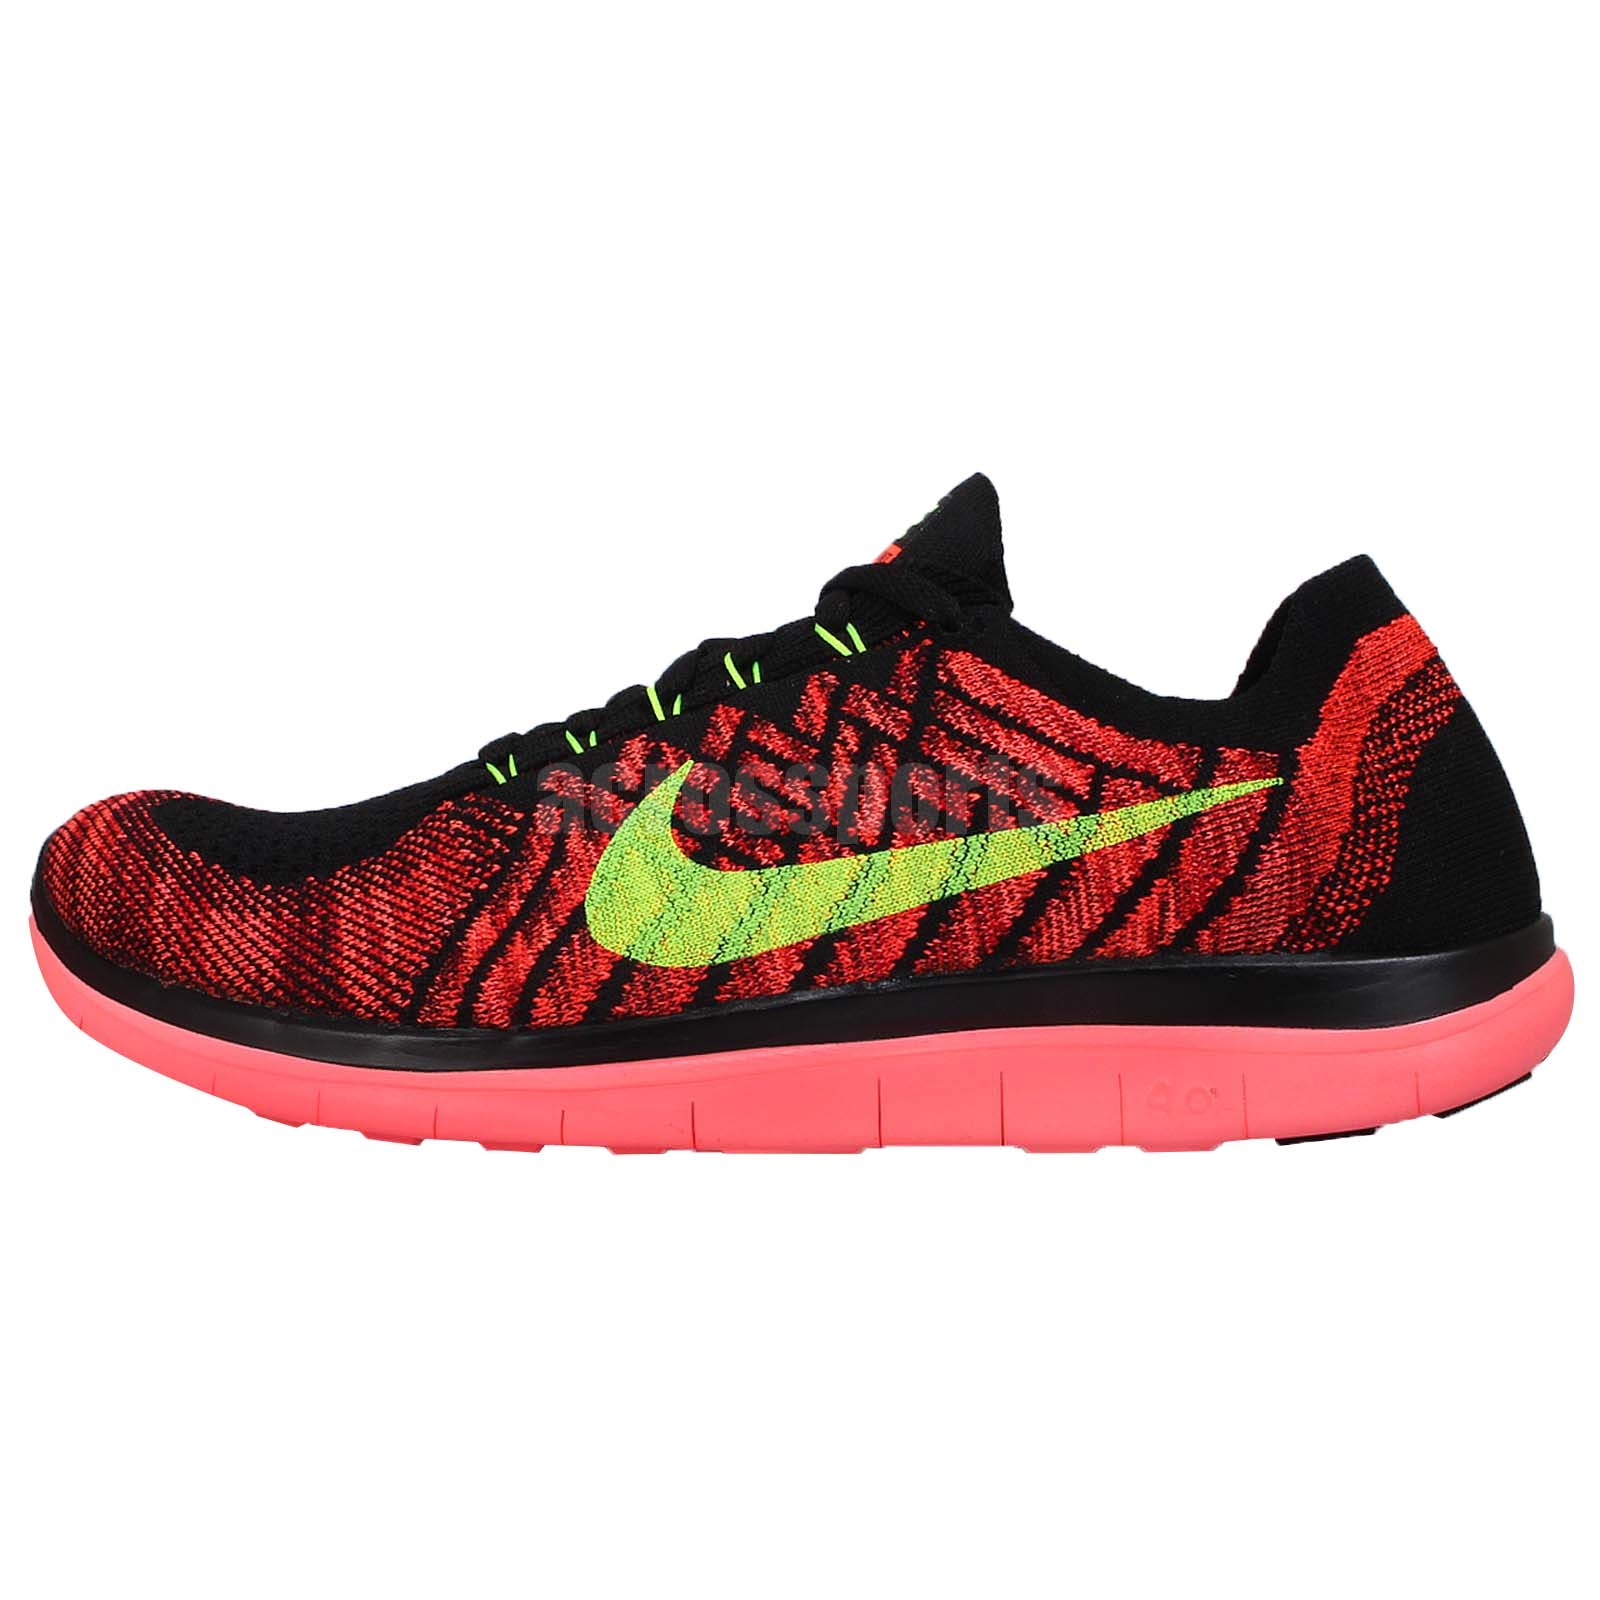 nike free 4 0 flyknit black pink volt mens running shoes